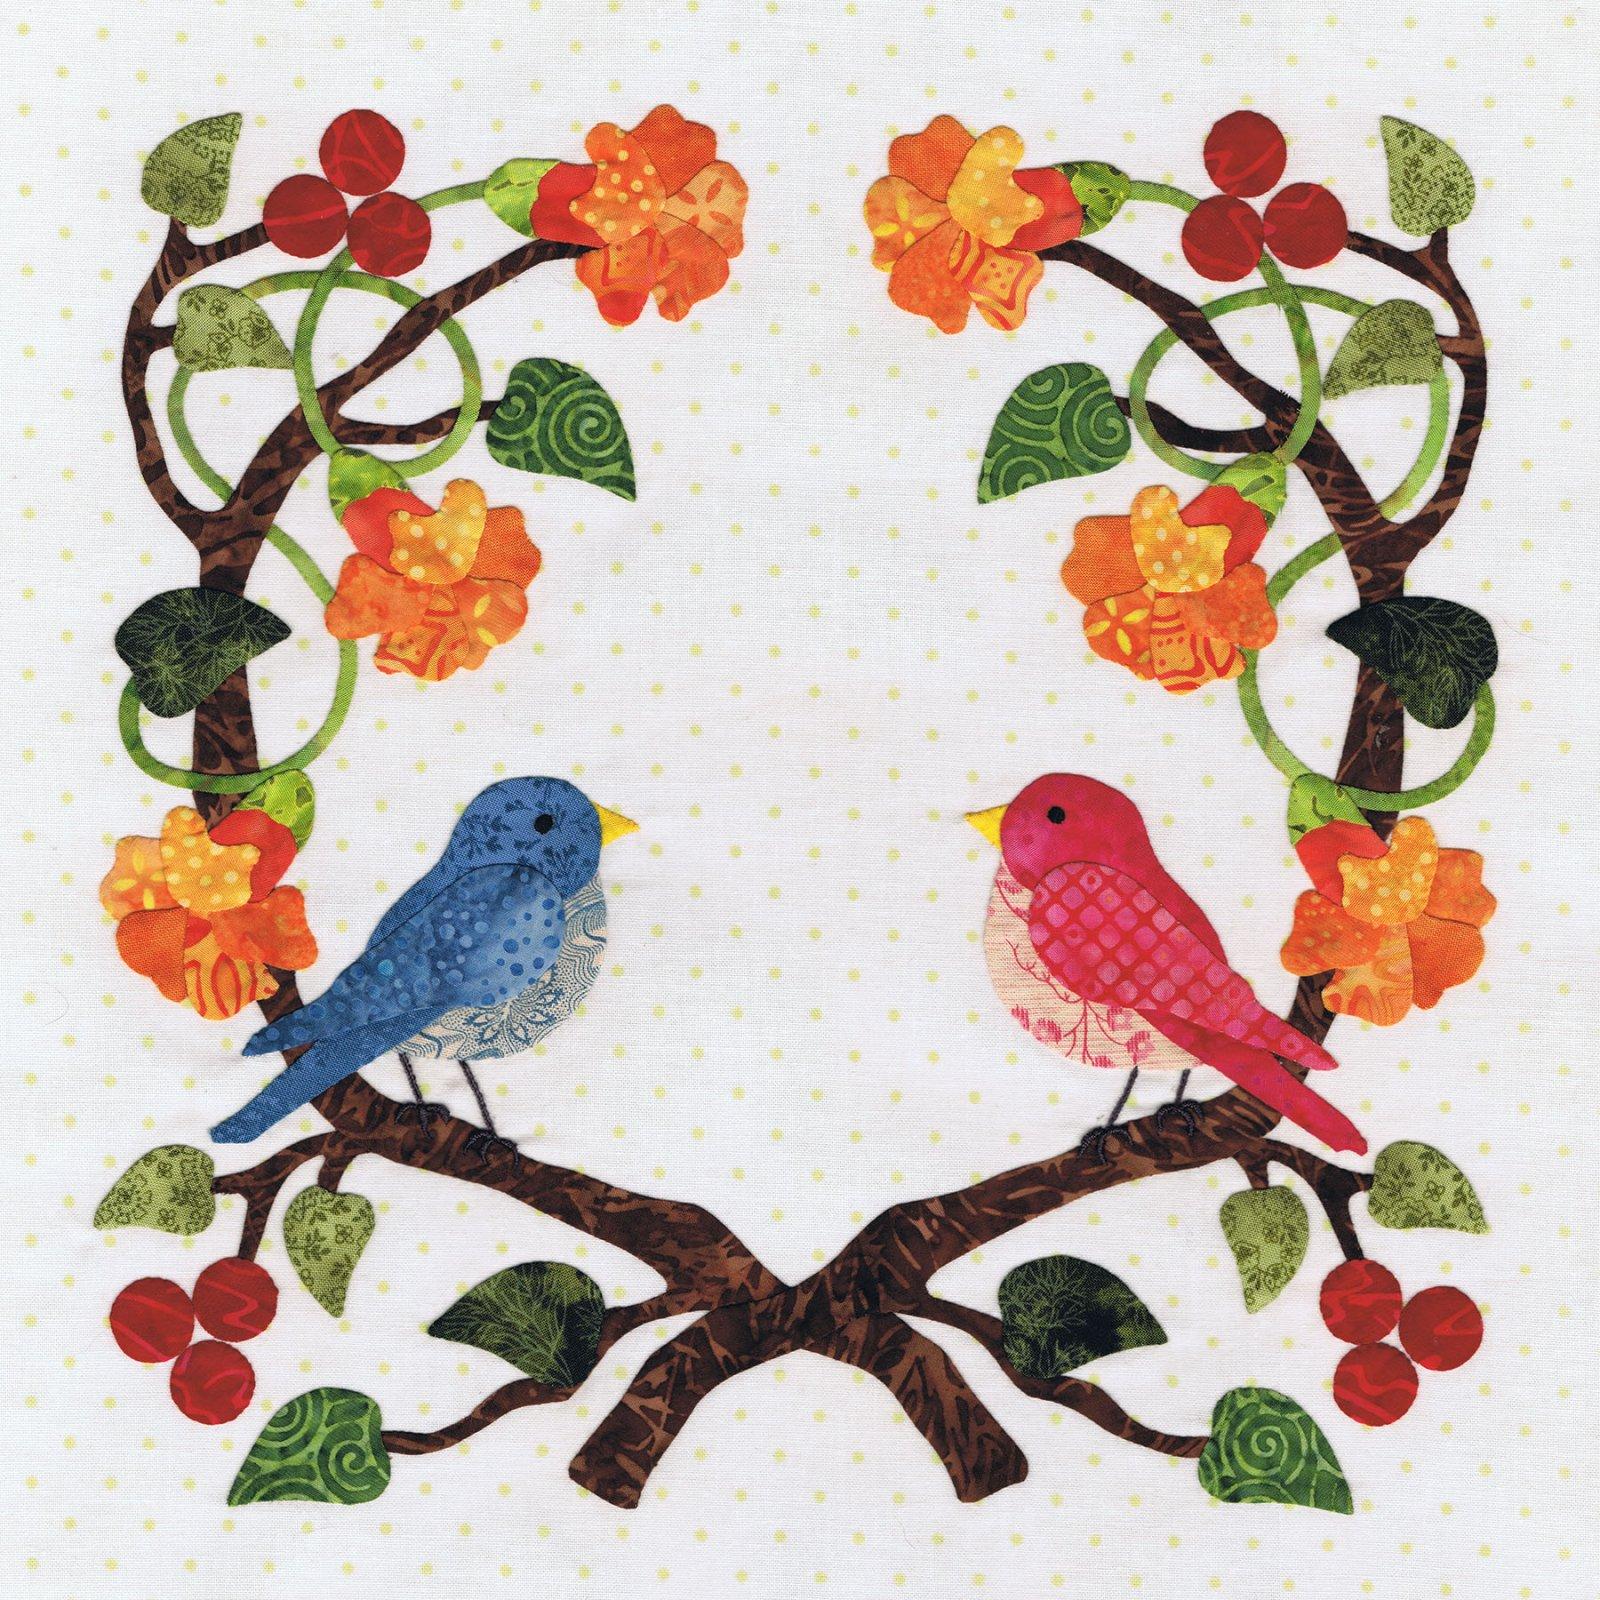 P3-2206 Love Bird Wreath